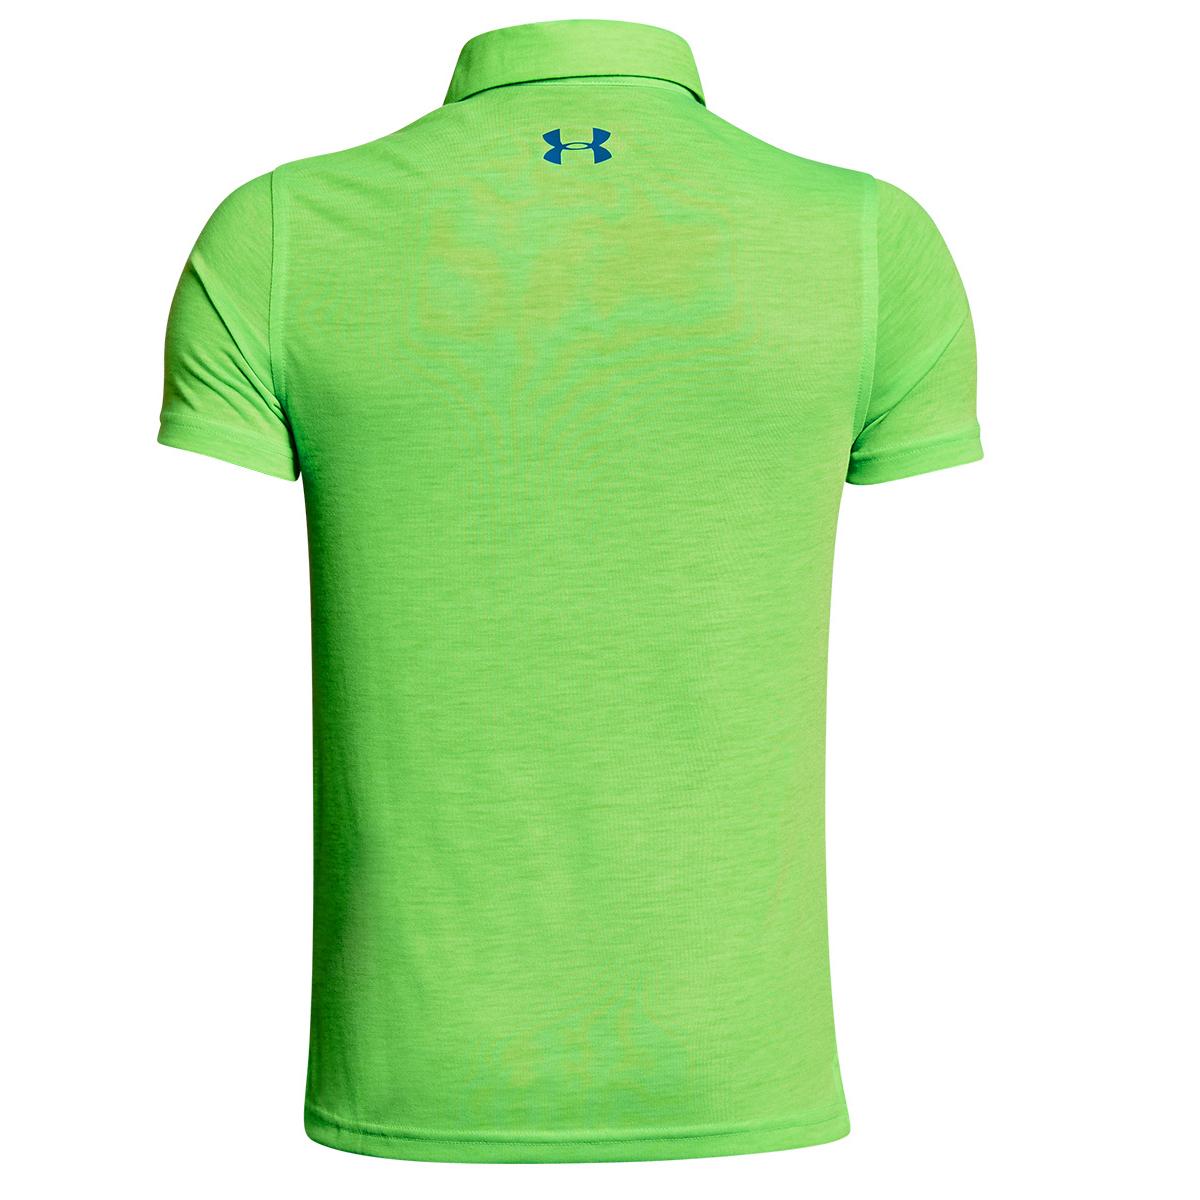 00a1897b Under Armour Junior Threadborne YD Engineered Polo Shirt | Online Golf